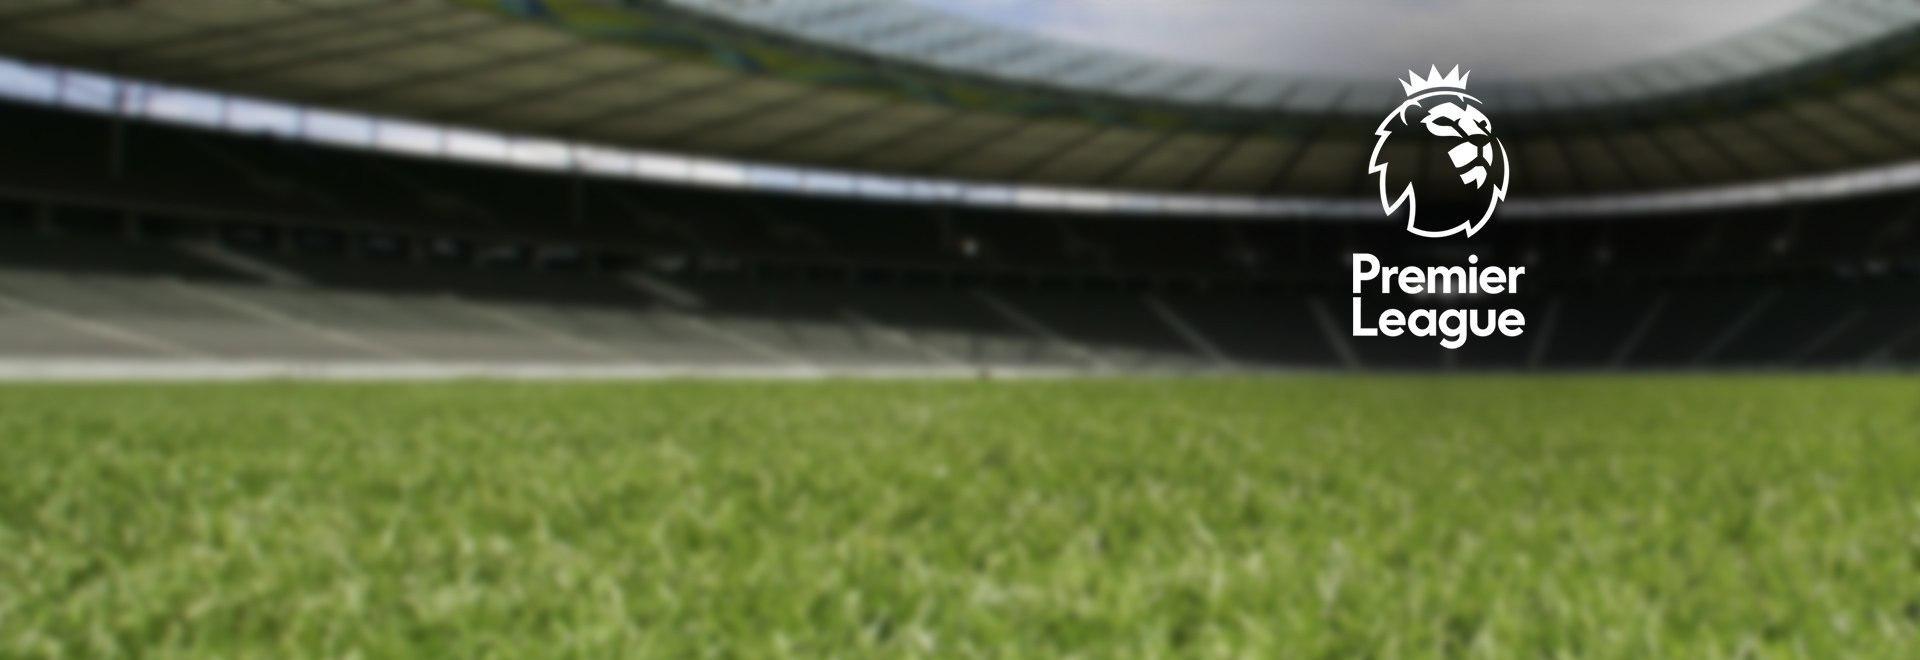 Fulham - West Ham United. 23a g.